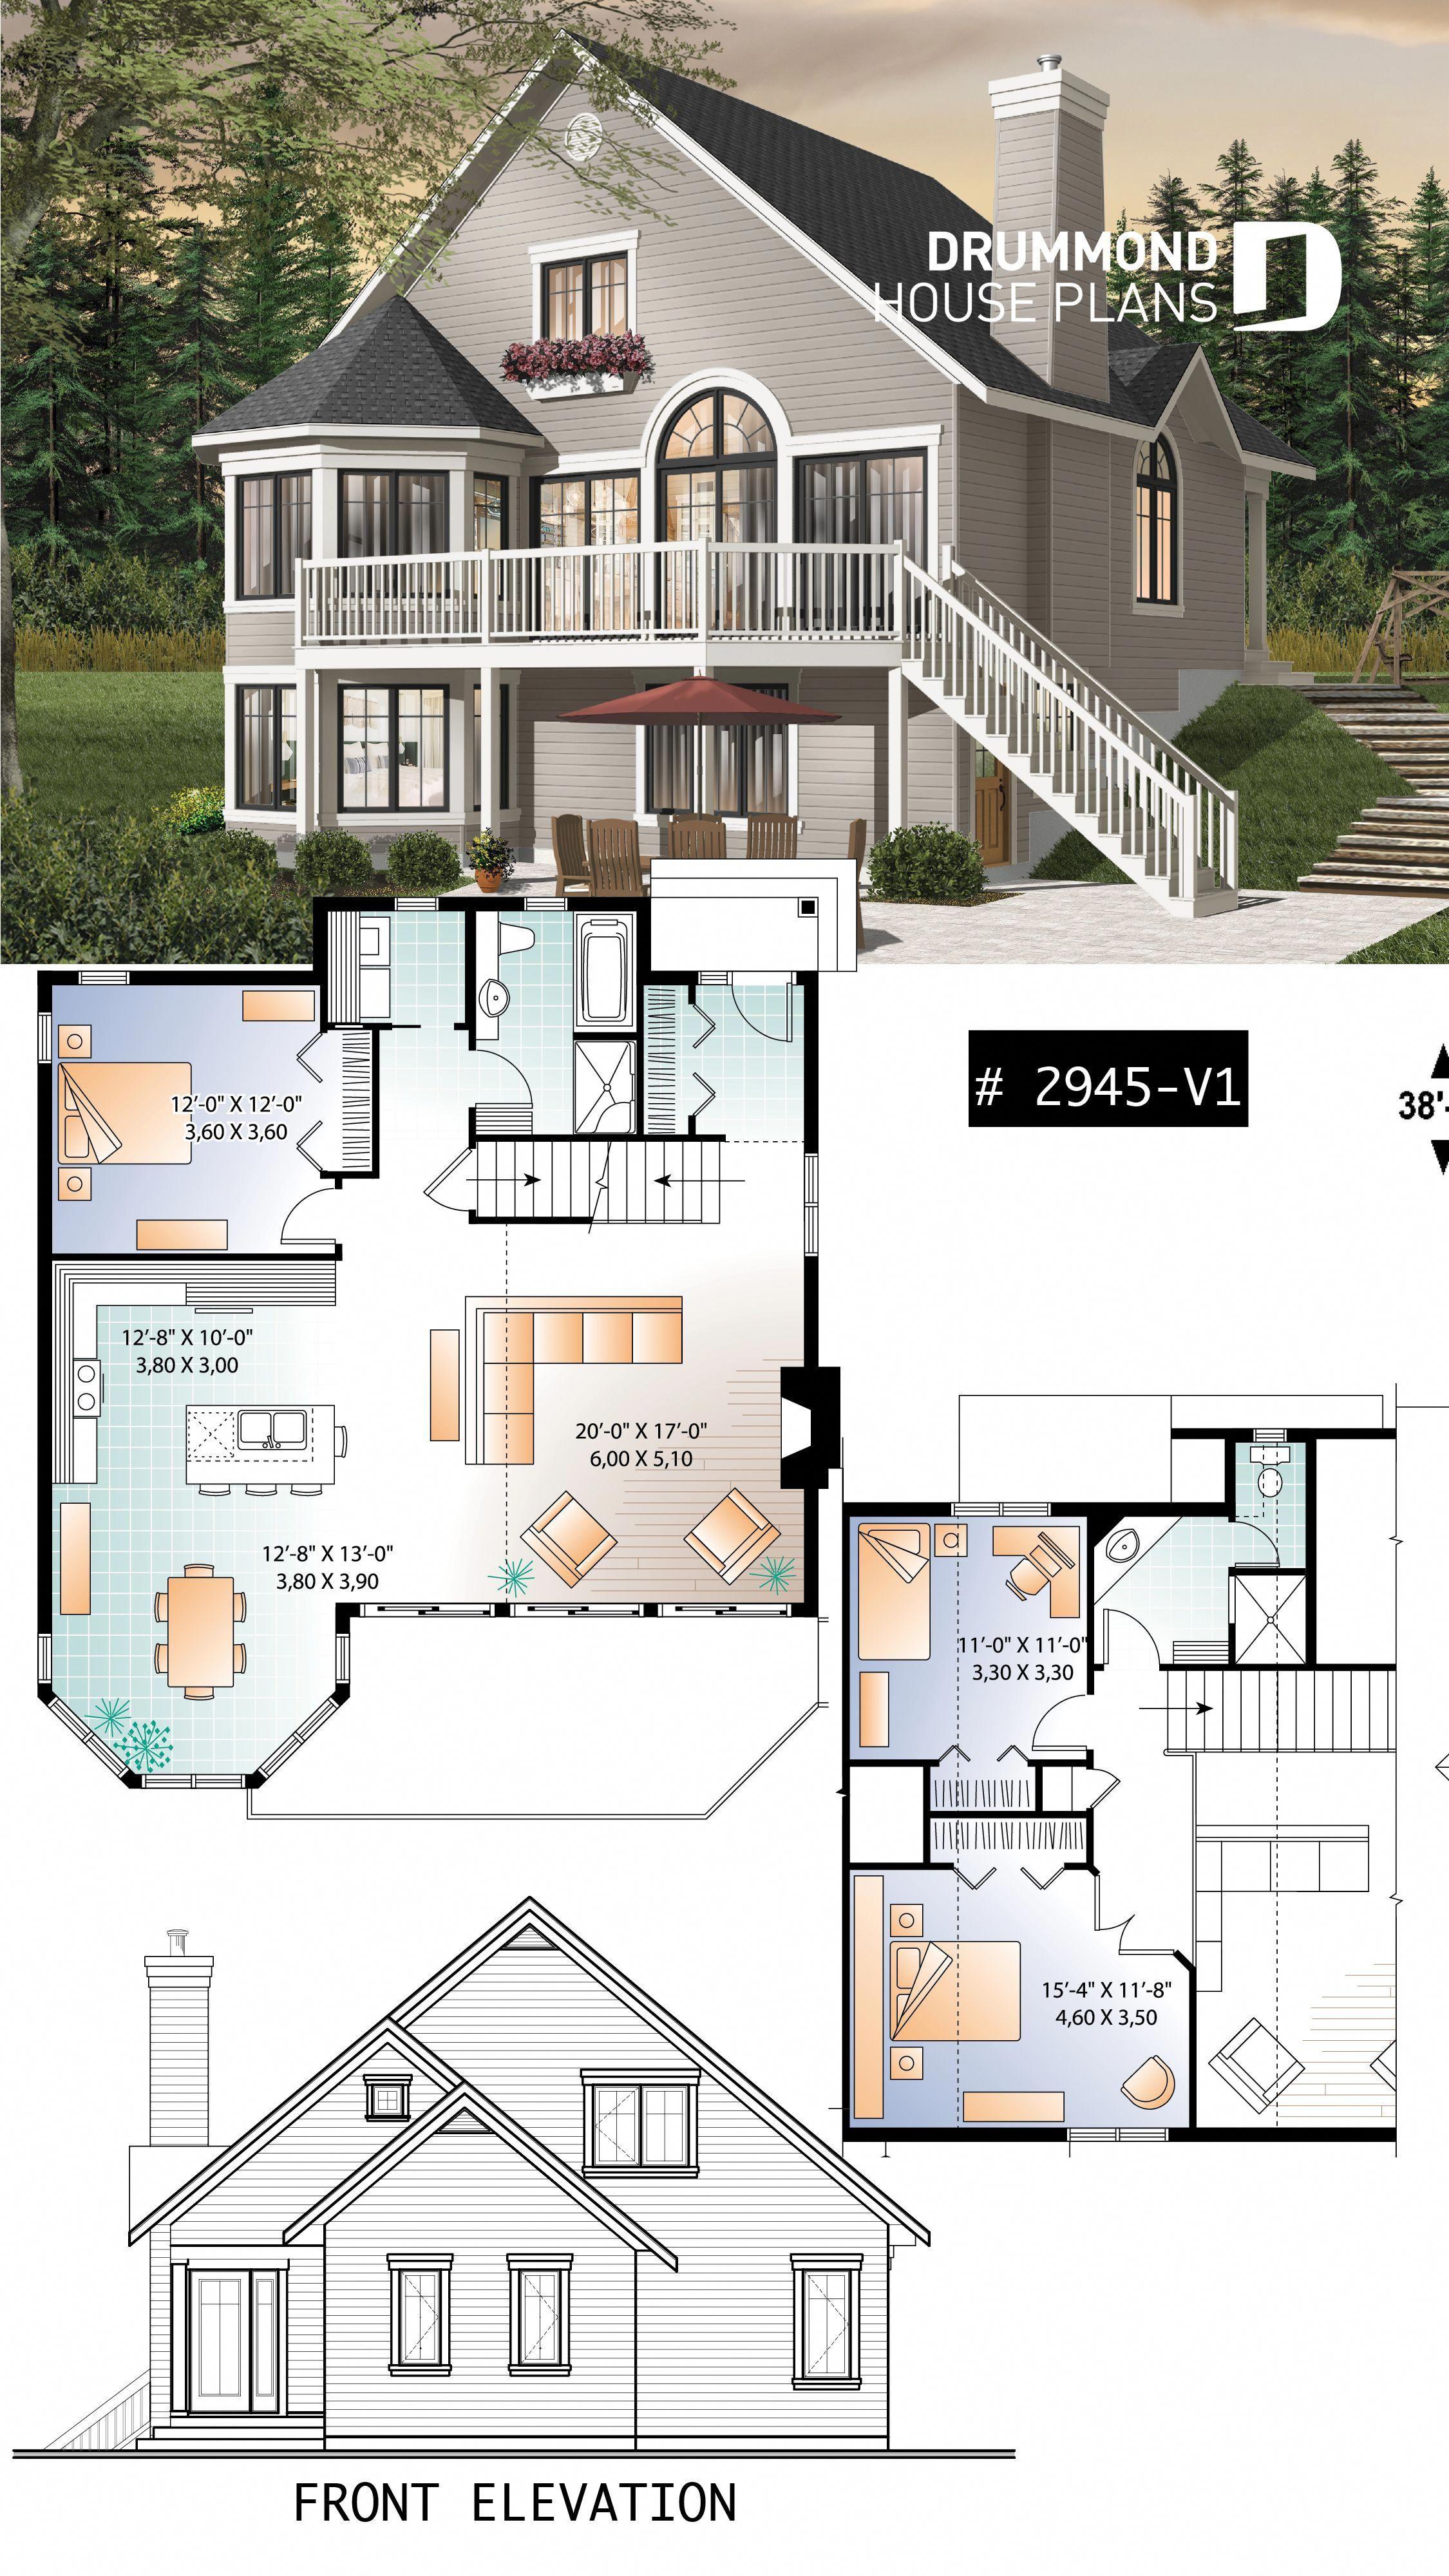 Popular 3 Bedroom Chalet With Mezzanine And Convivial Floor Plan Chalet Cottage Plan Houseplan H Sims 4 House Building Sims House Plans Sims 4 House Plans